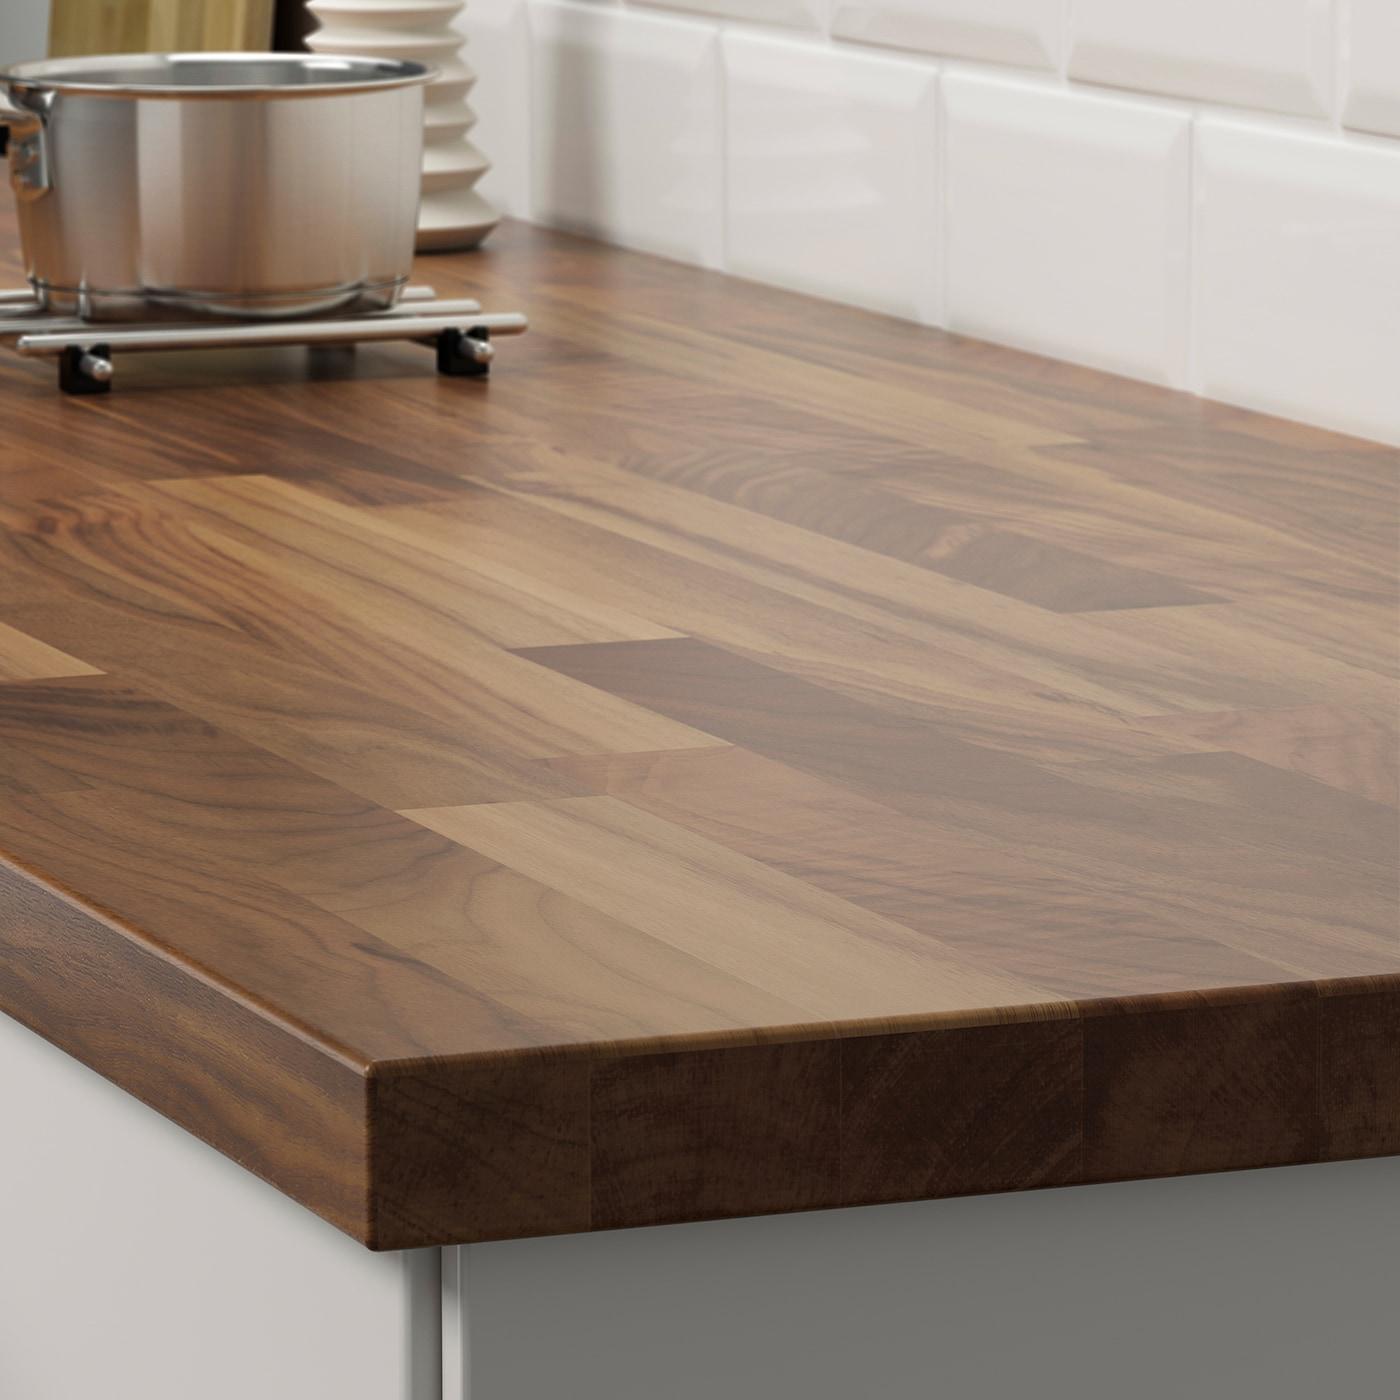 Karlby Countertop For Kitchen Island Walnut Veneer 74x42x1 1 2 Ikea